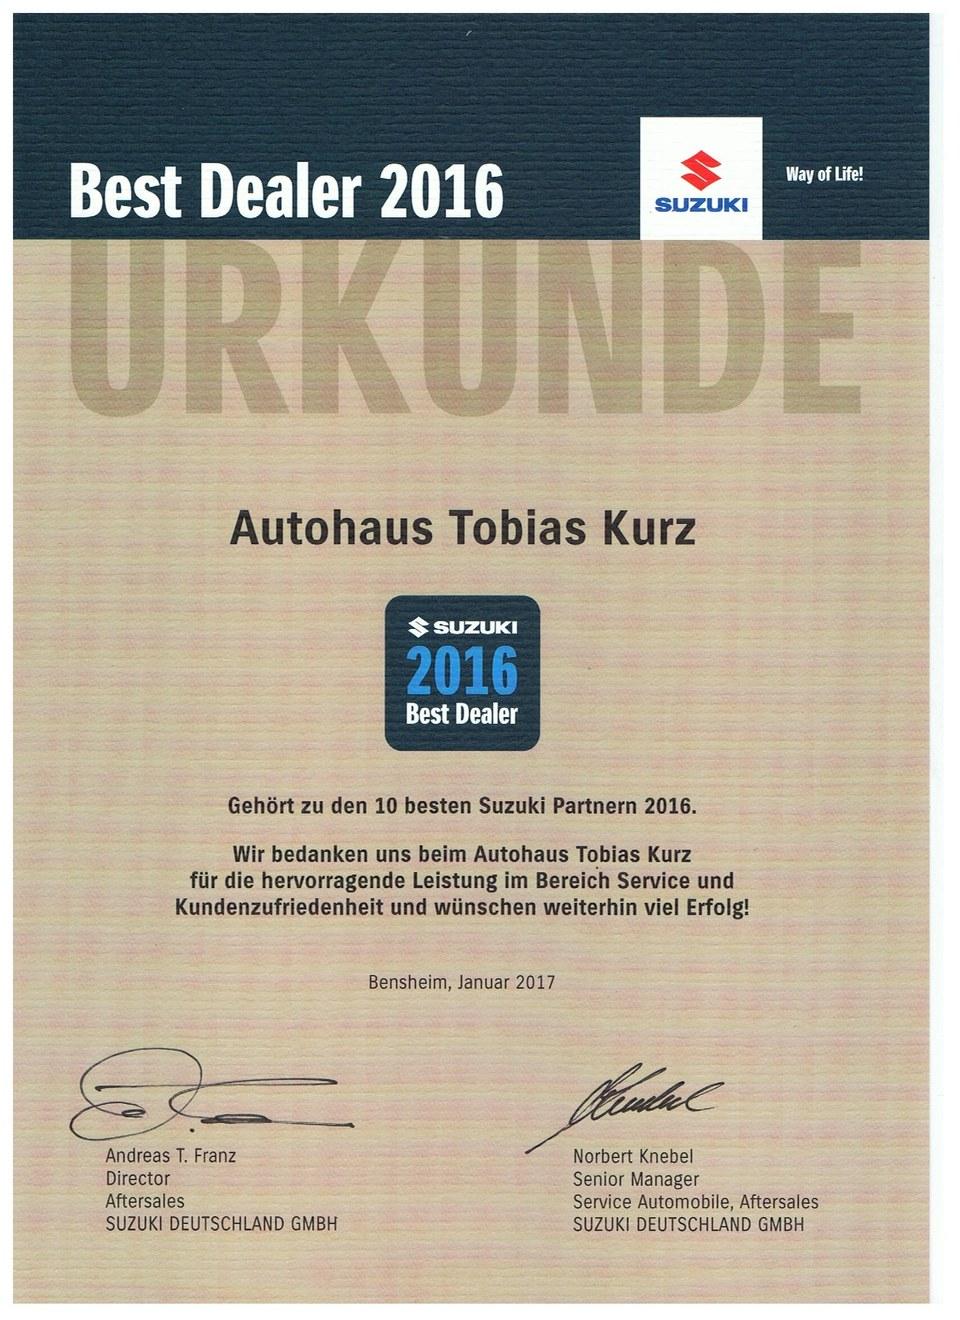 Best Dealer 2016